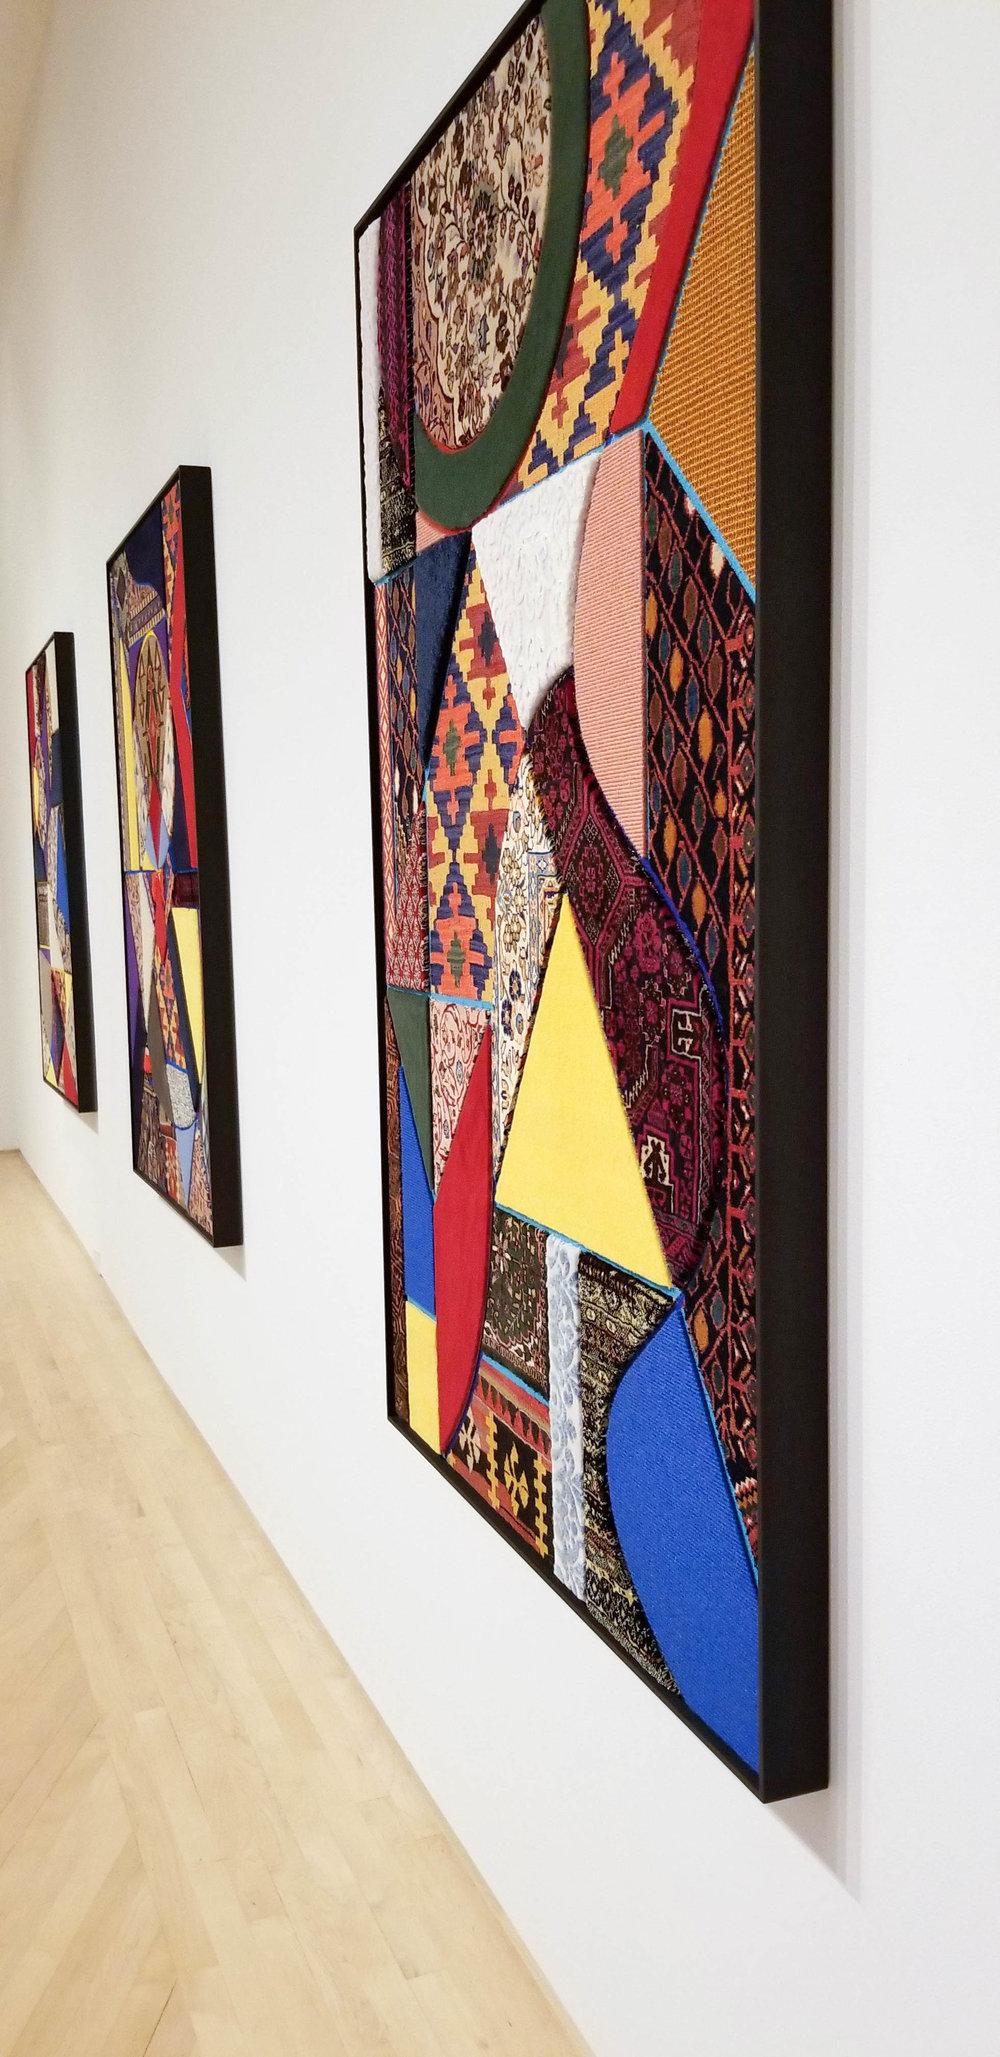 Social Fabric (series), Nevin Aladag